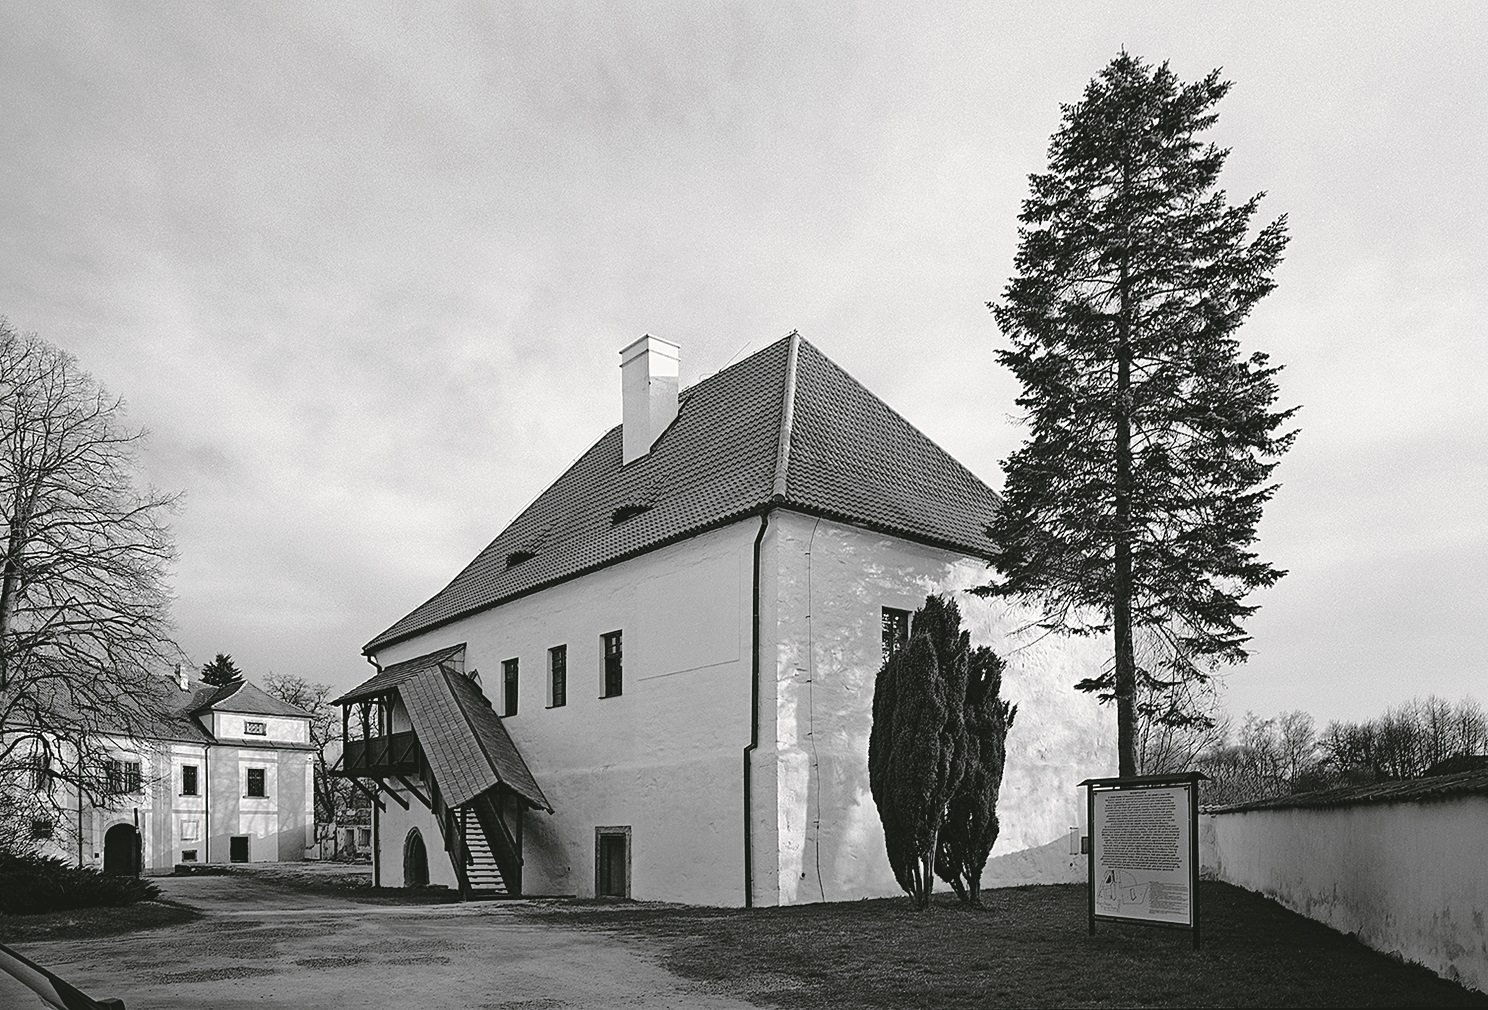 Latinská škola vareálu kláštera premonstrátů, Milevsko